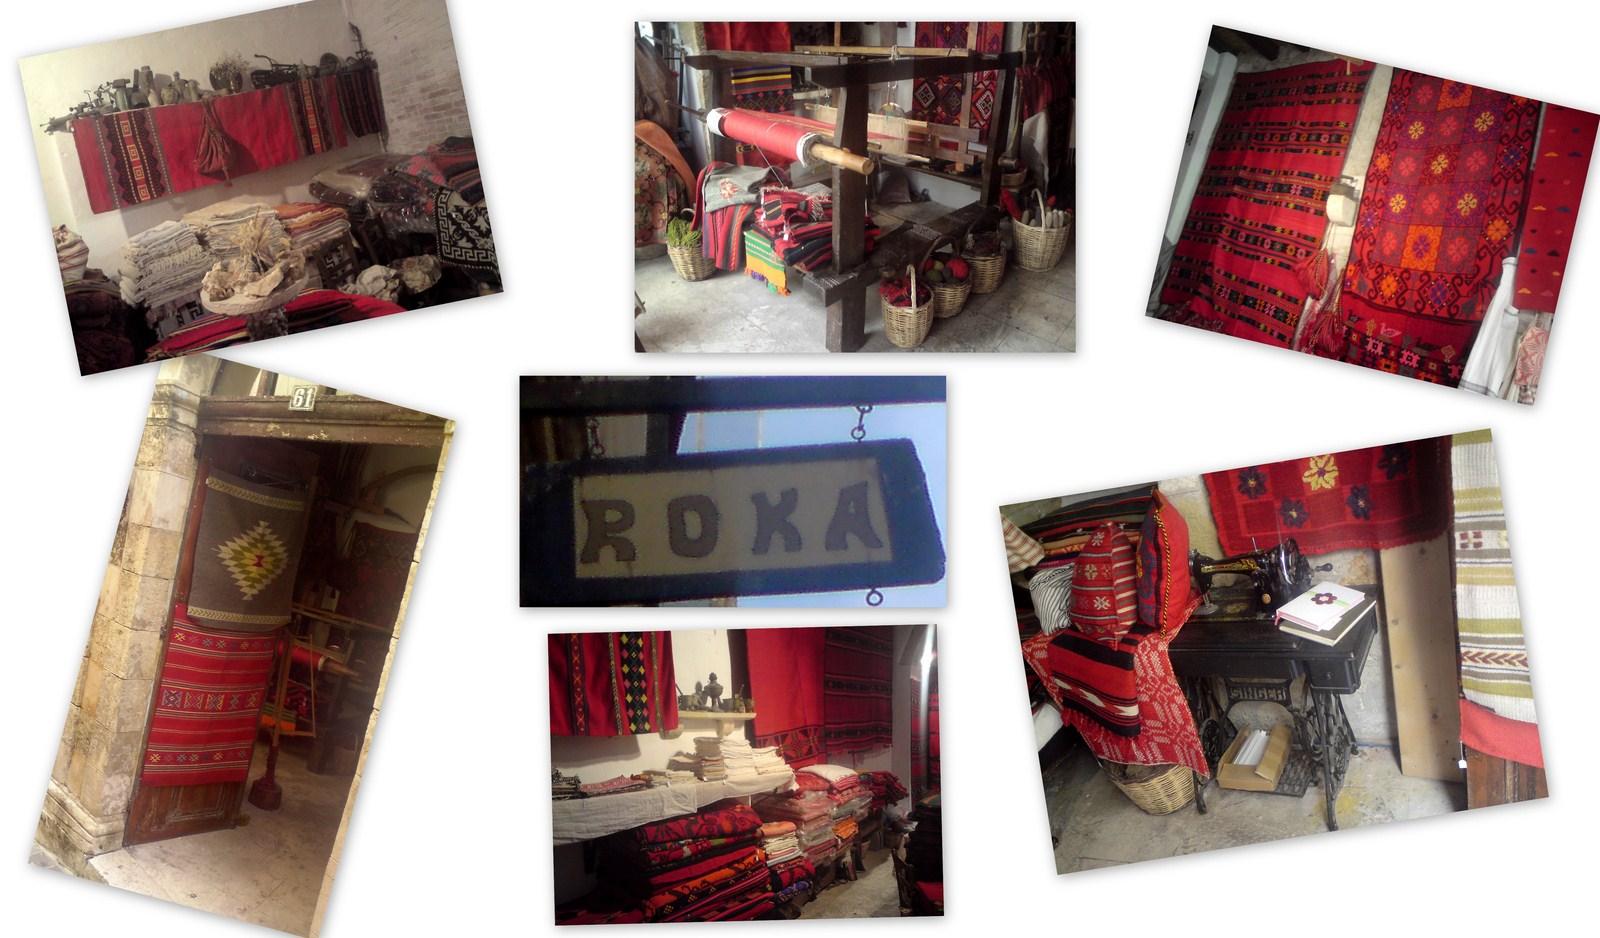 chania-roka-collage